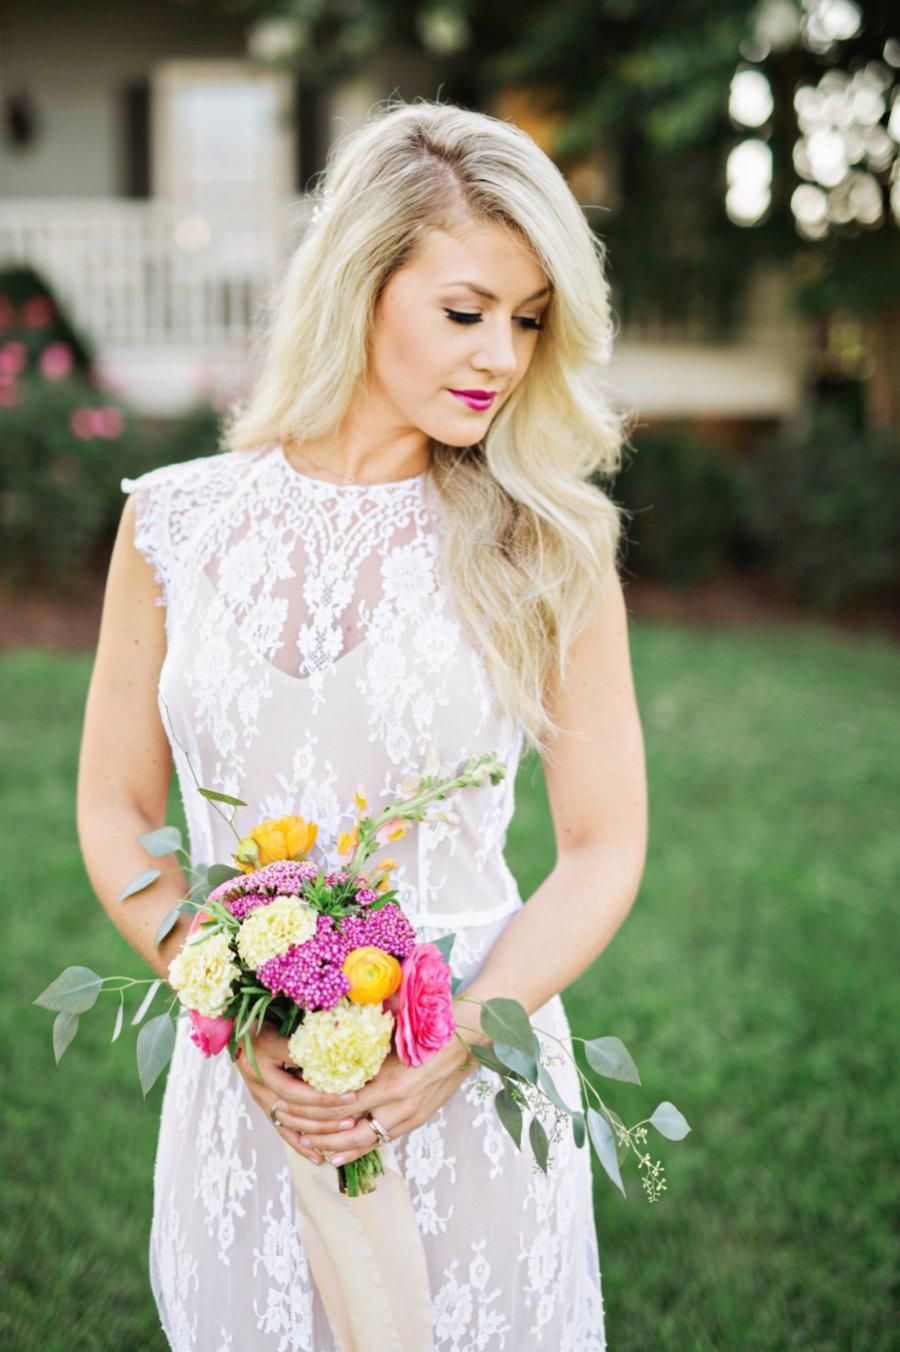 Colorful Southern Farm Wedding Inspiration via TheELD.com